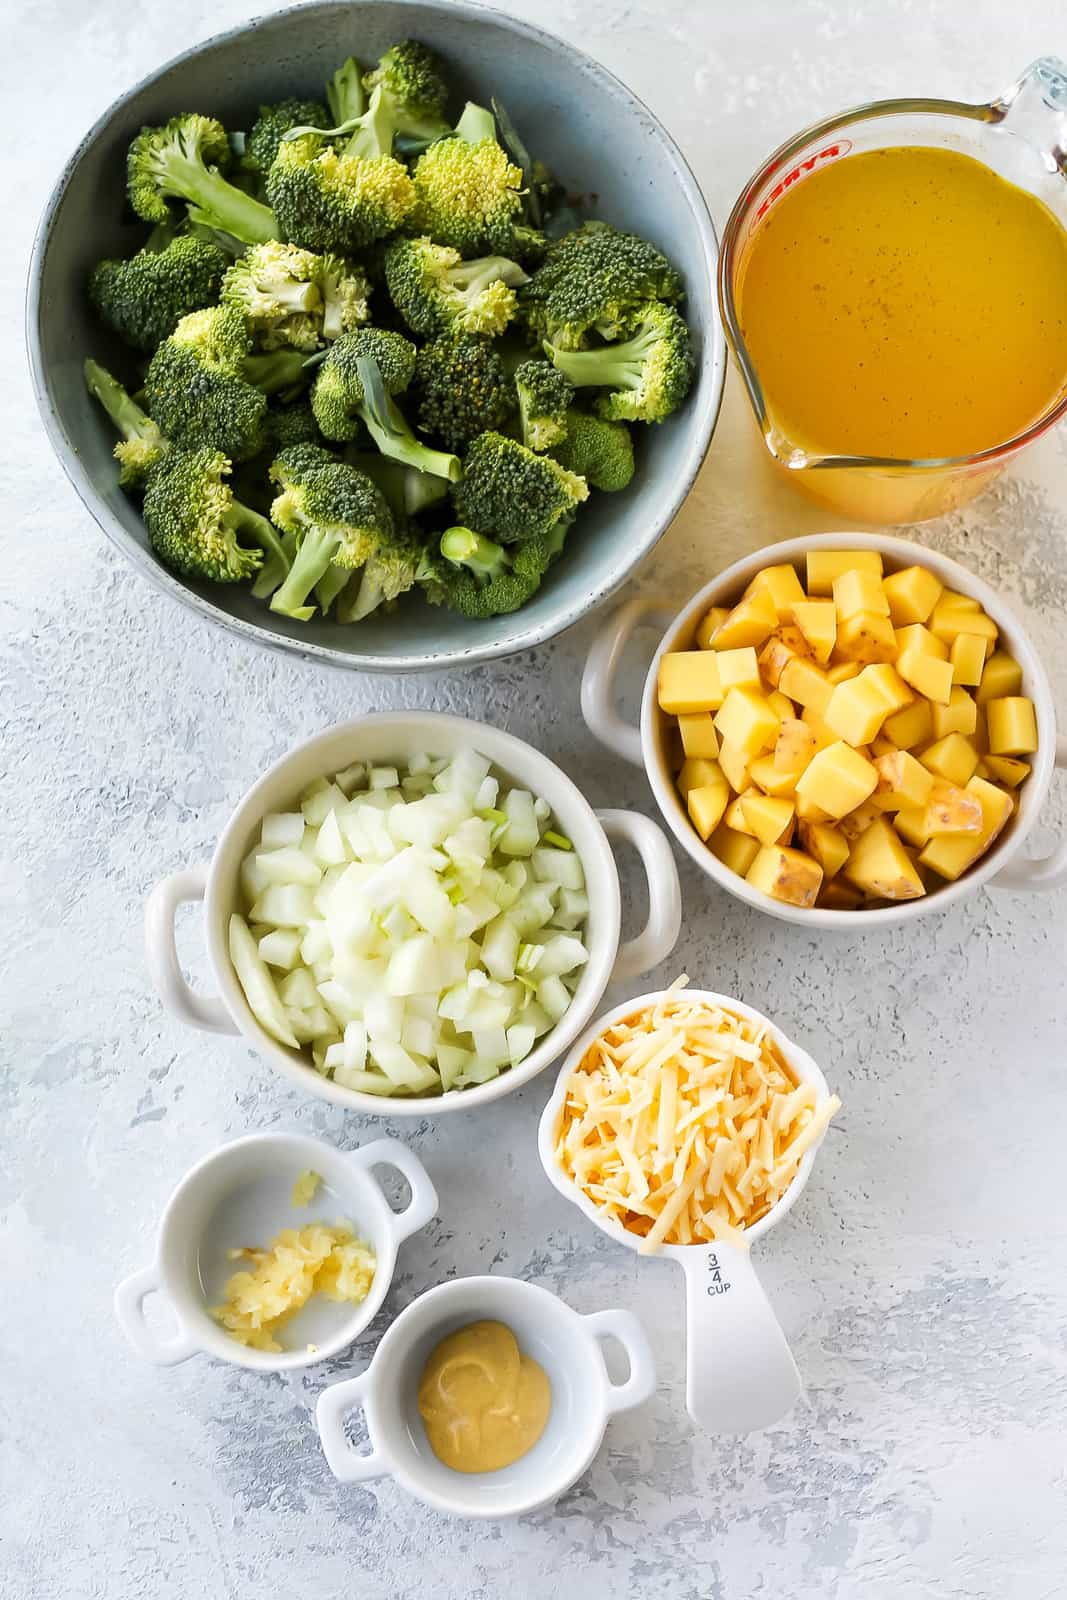 broccoli, vegetable broth, potatoes, onion, garlic, cheddar, dijon mustard, and oil on a grey background